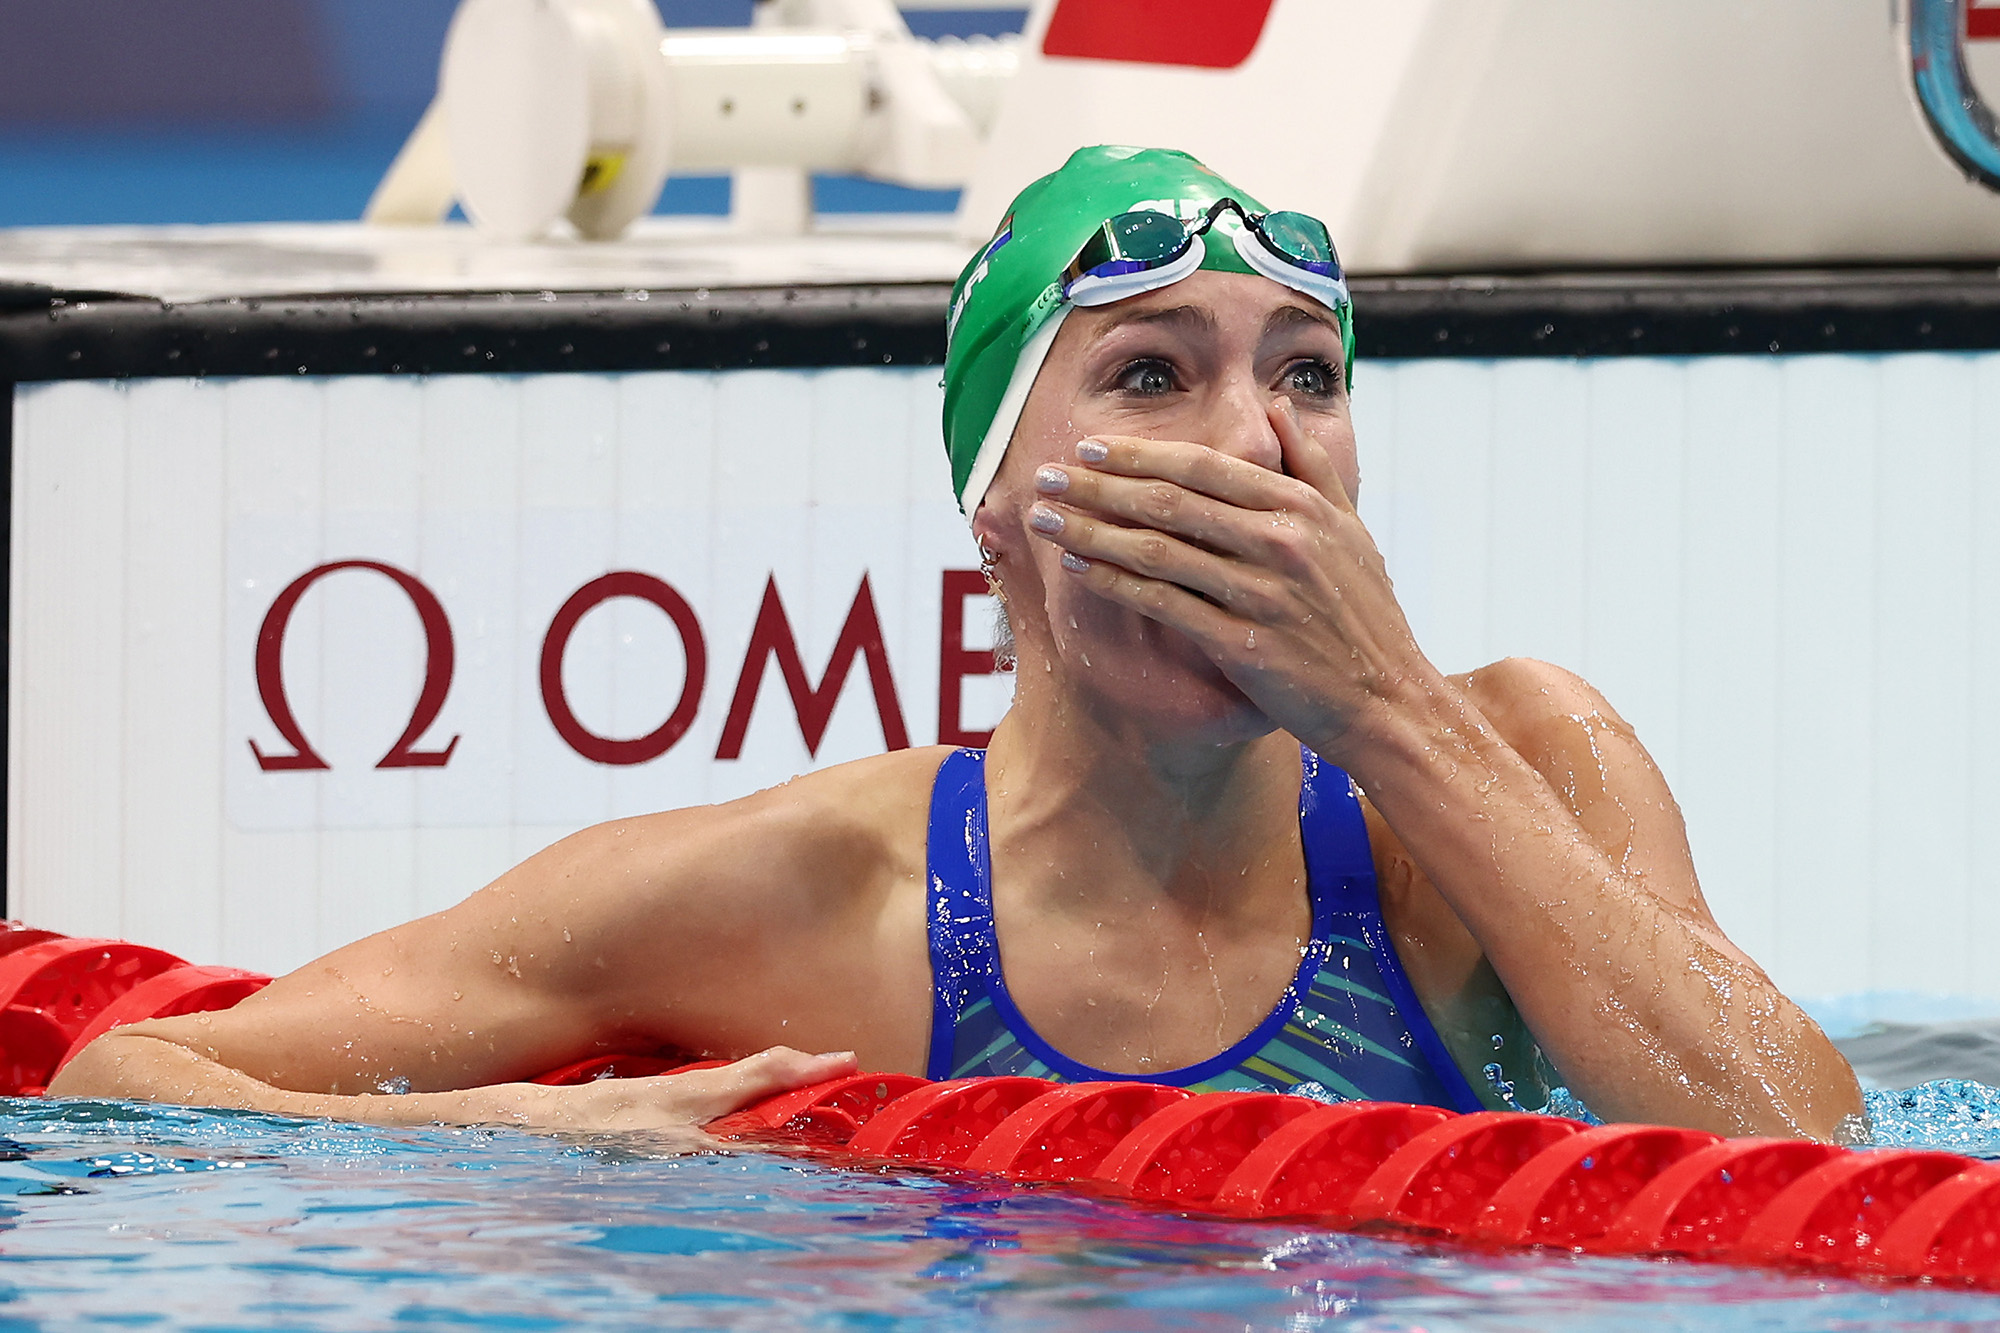 TOKYO 2020: Tatjana Schoenmaker strikes Olympic gold and smashes world record